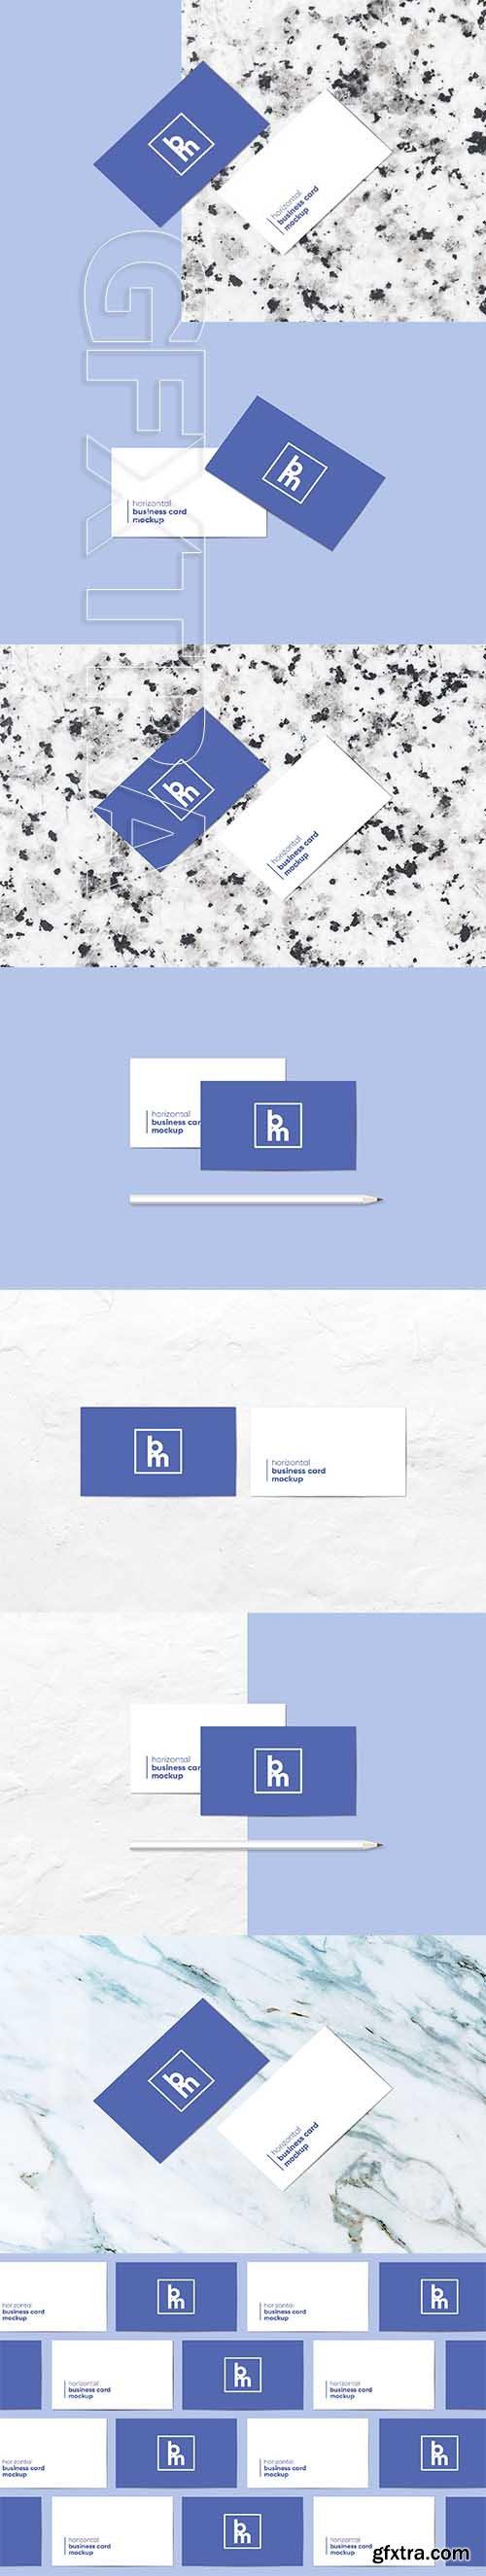 CreativeMarket - Business Card Mockup 2580548